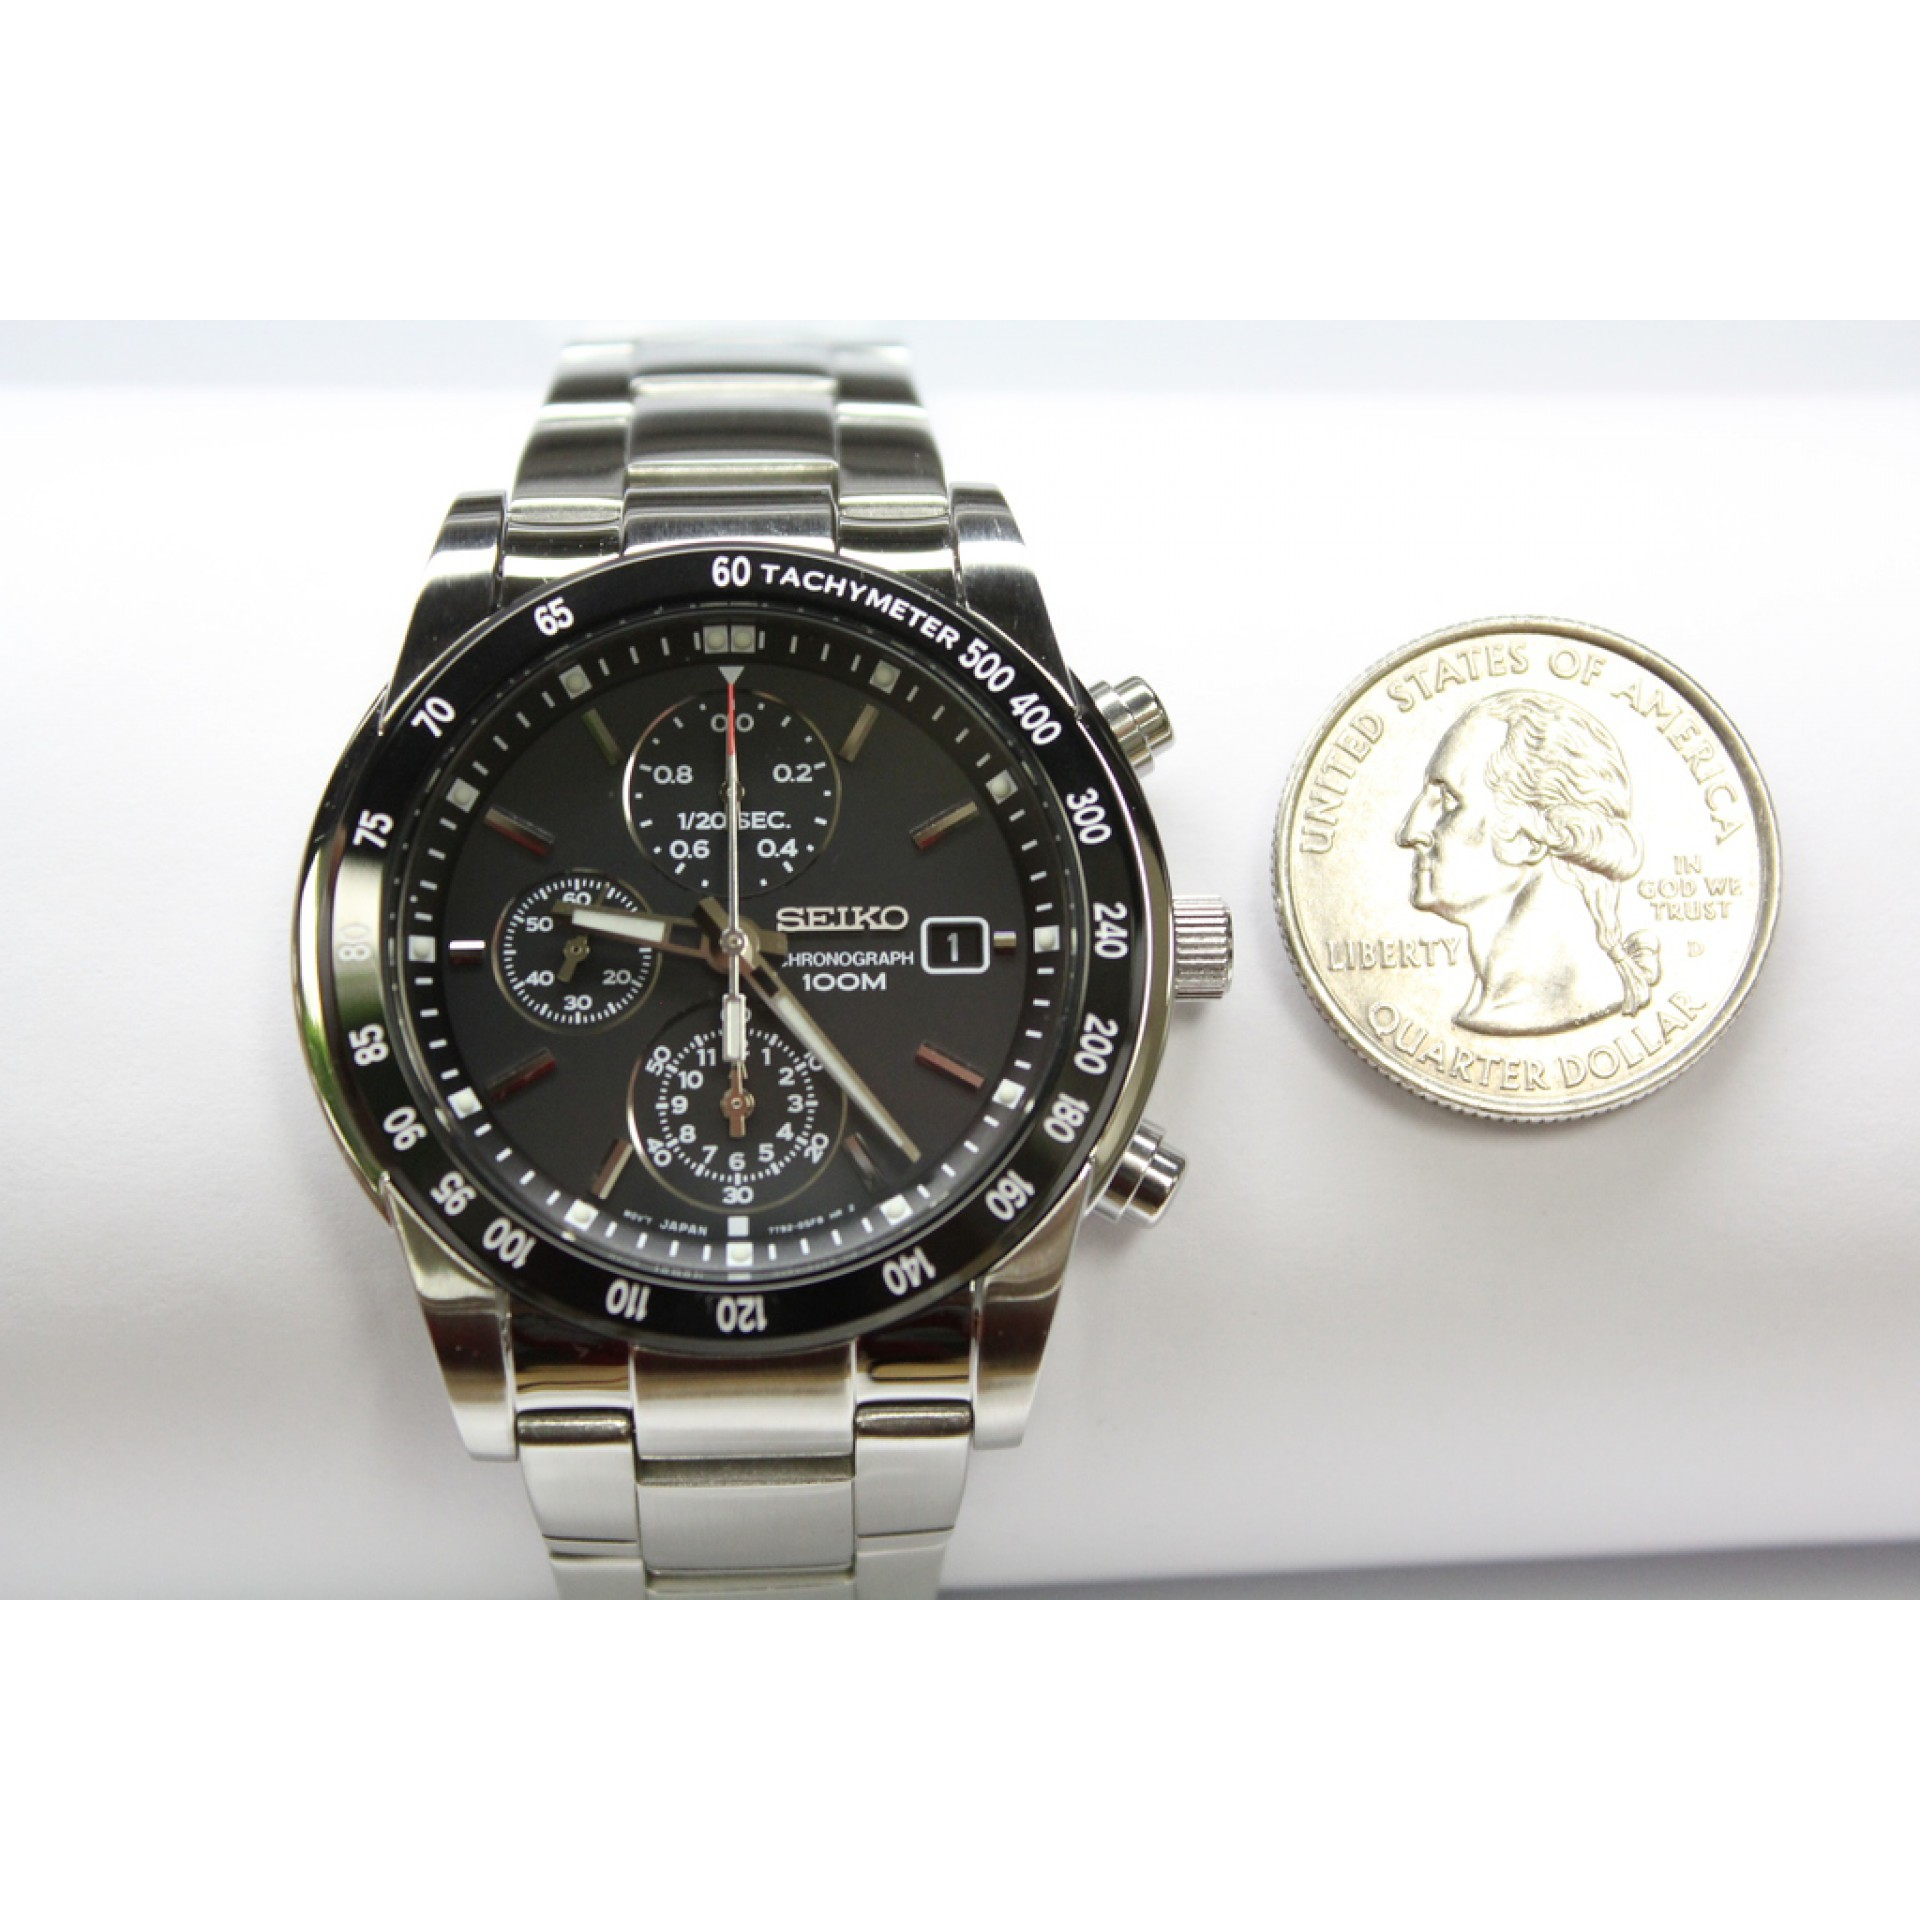 Seiko Chronograph Sports Watch (SNDC99P1